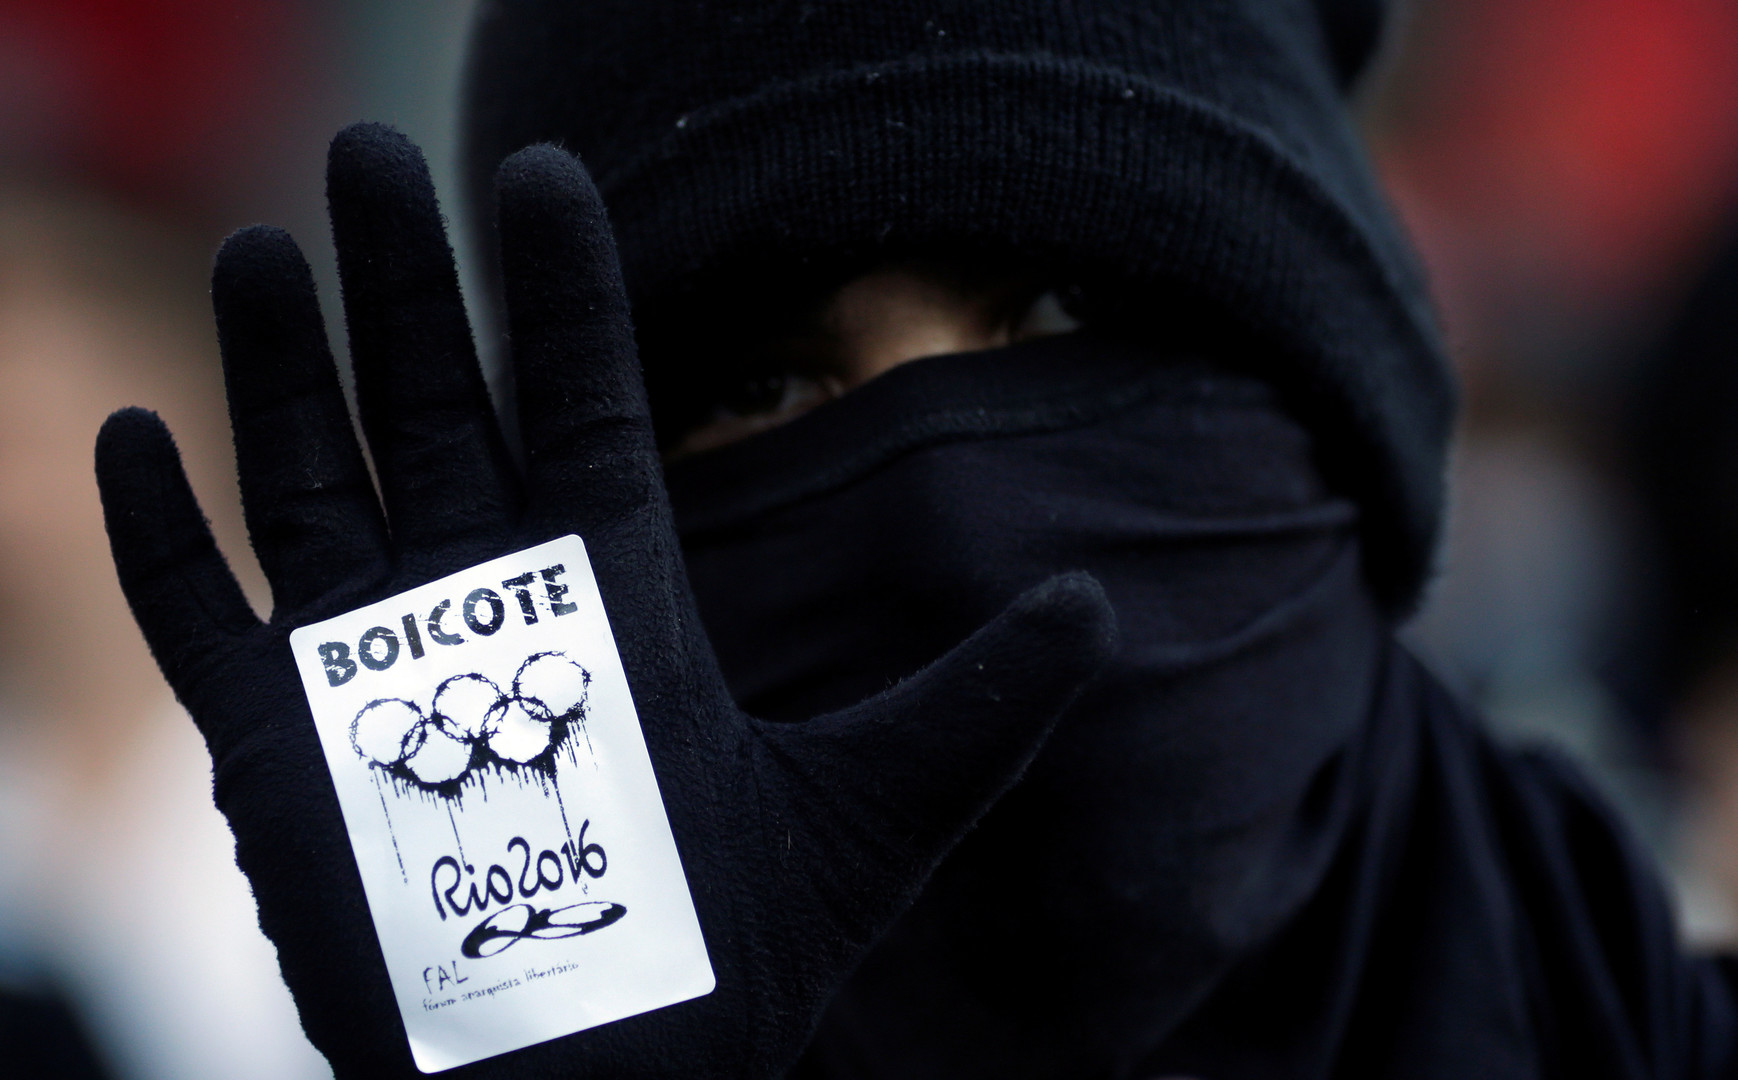 Общий незачёт: Олимпиада в Рио пройдёт на фоне кризиса и протестов